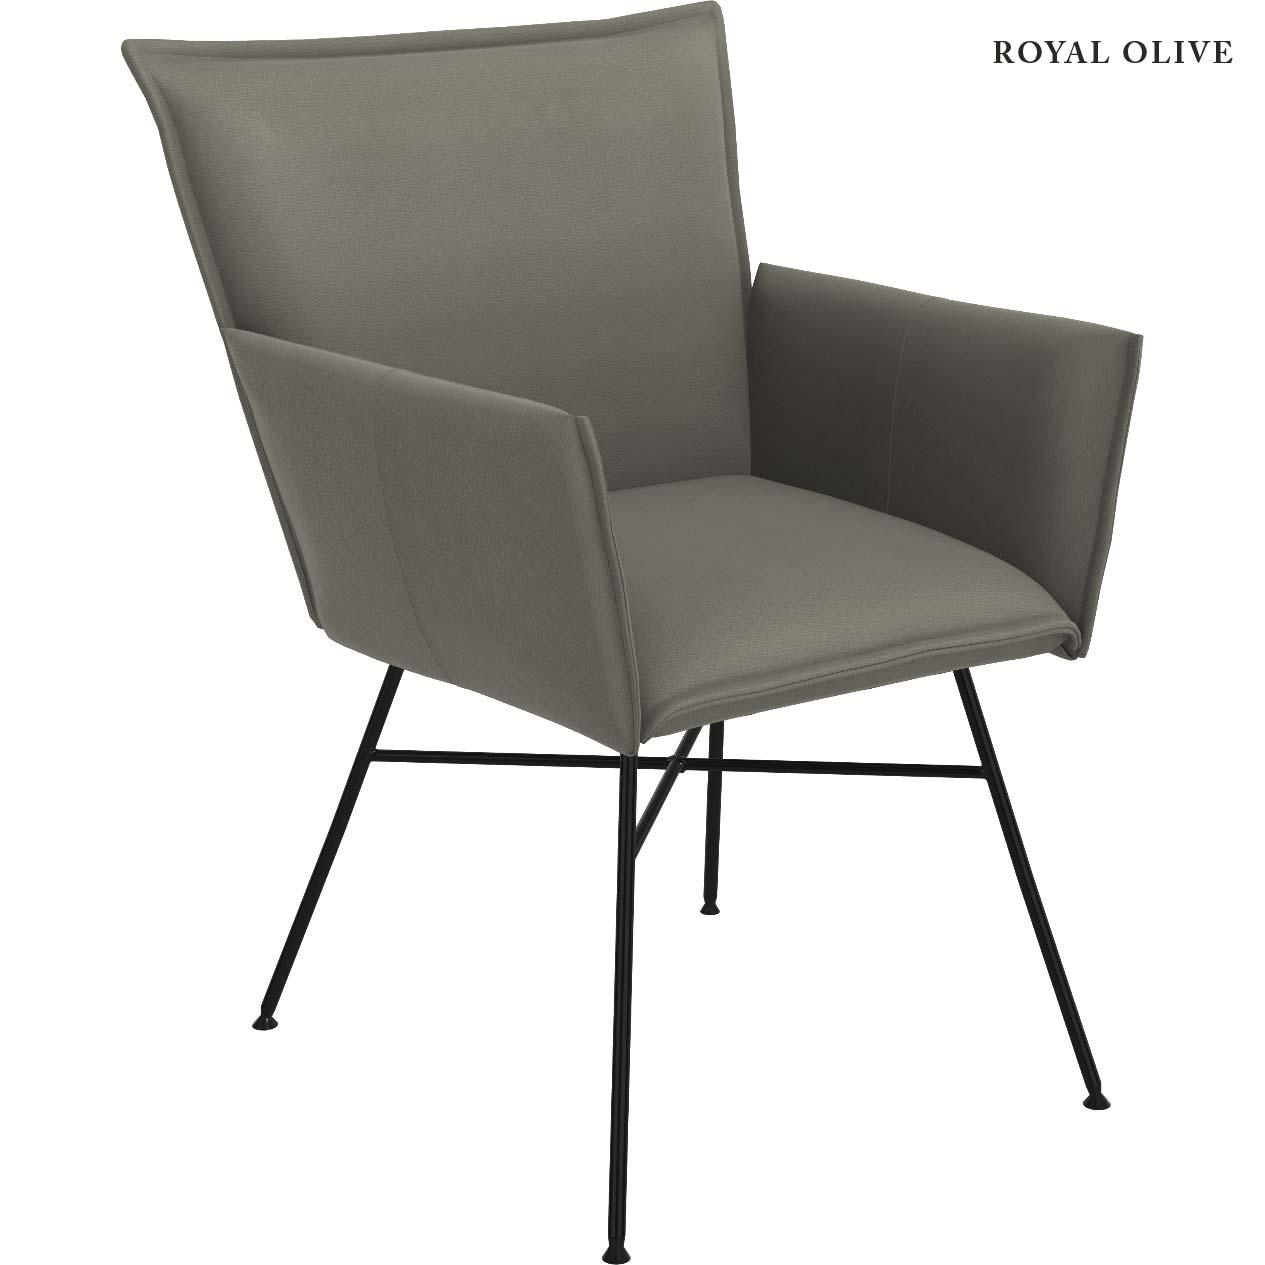 jess-design-sessel-stuhl-sanne-armlehne-royal-olive-lichtraum24